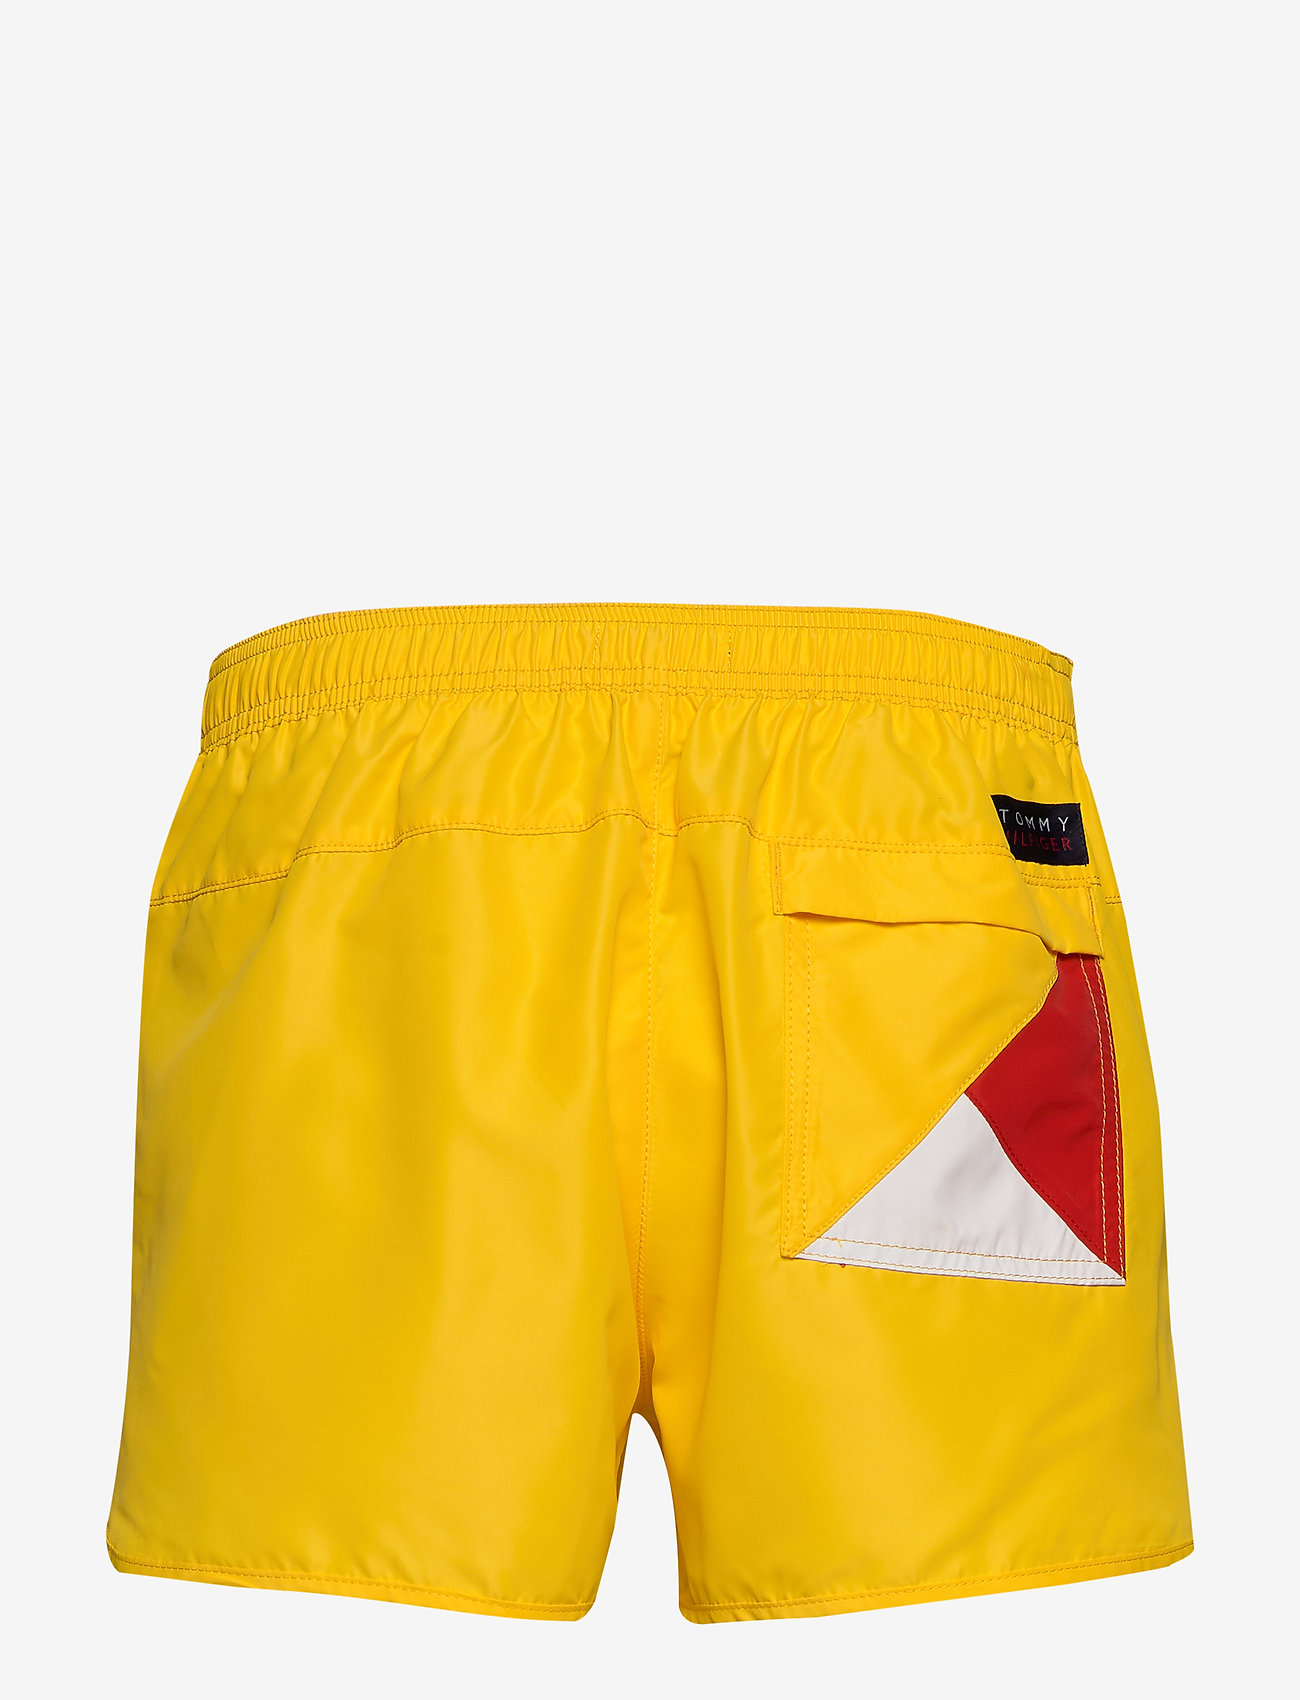 Tommy Hilfiger - RUNNER - swim shorts - bold yellow - 1